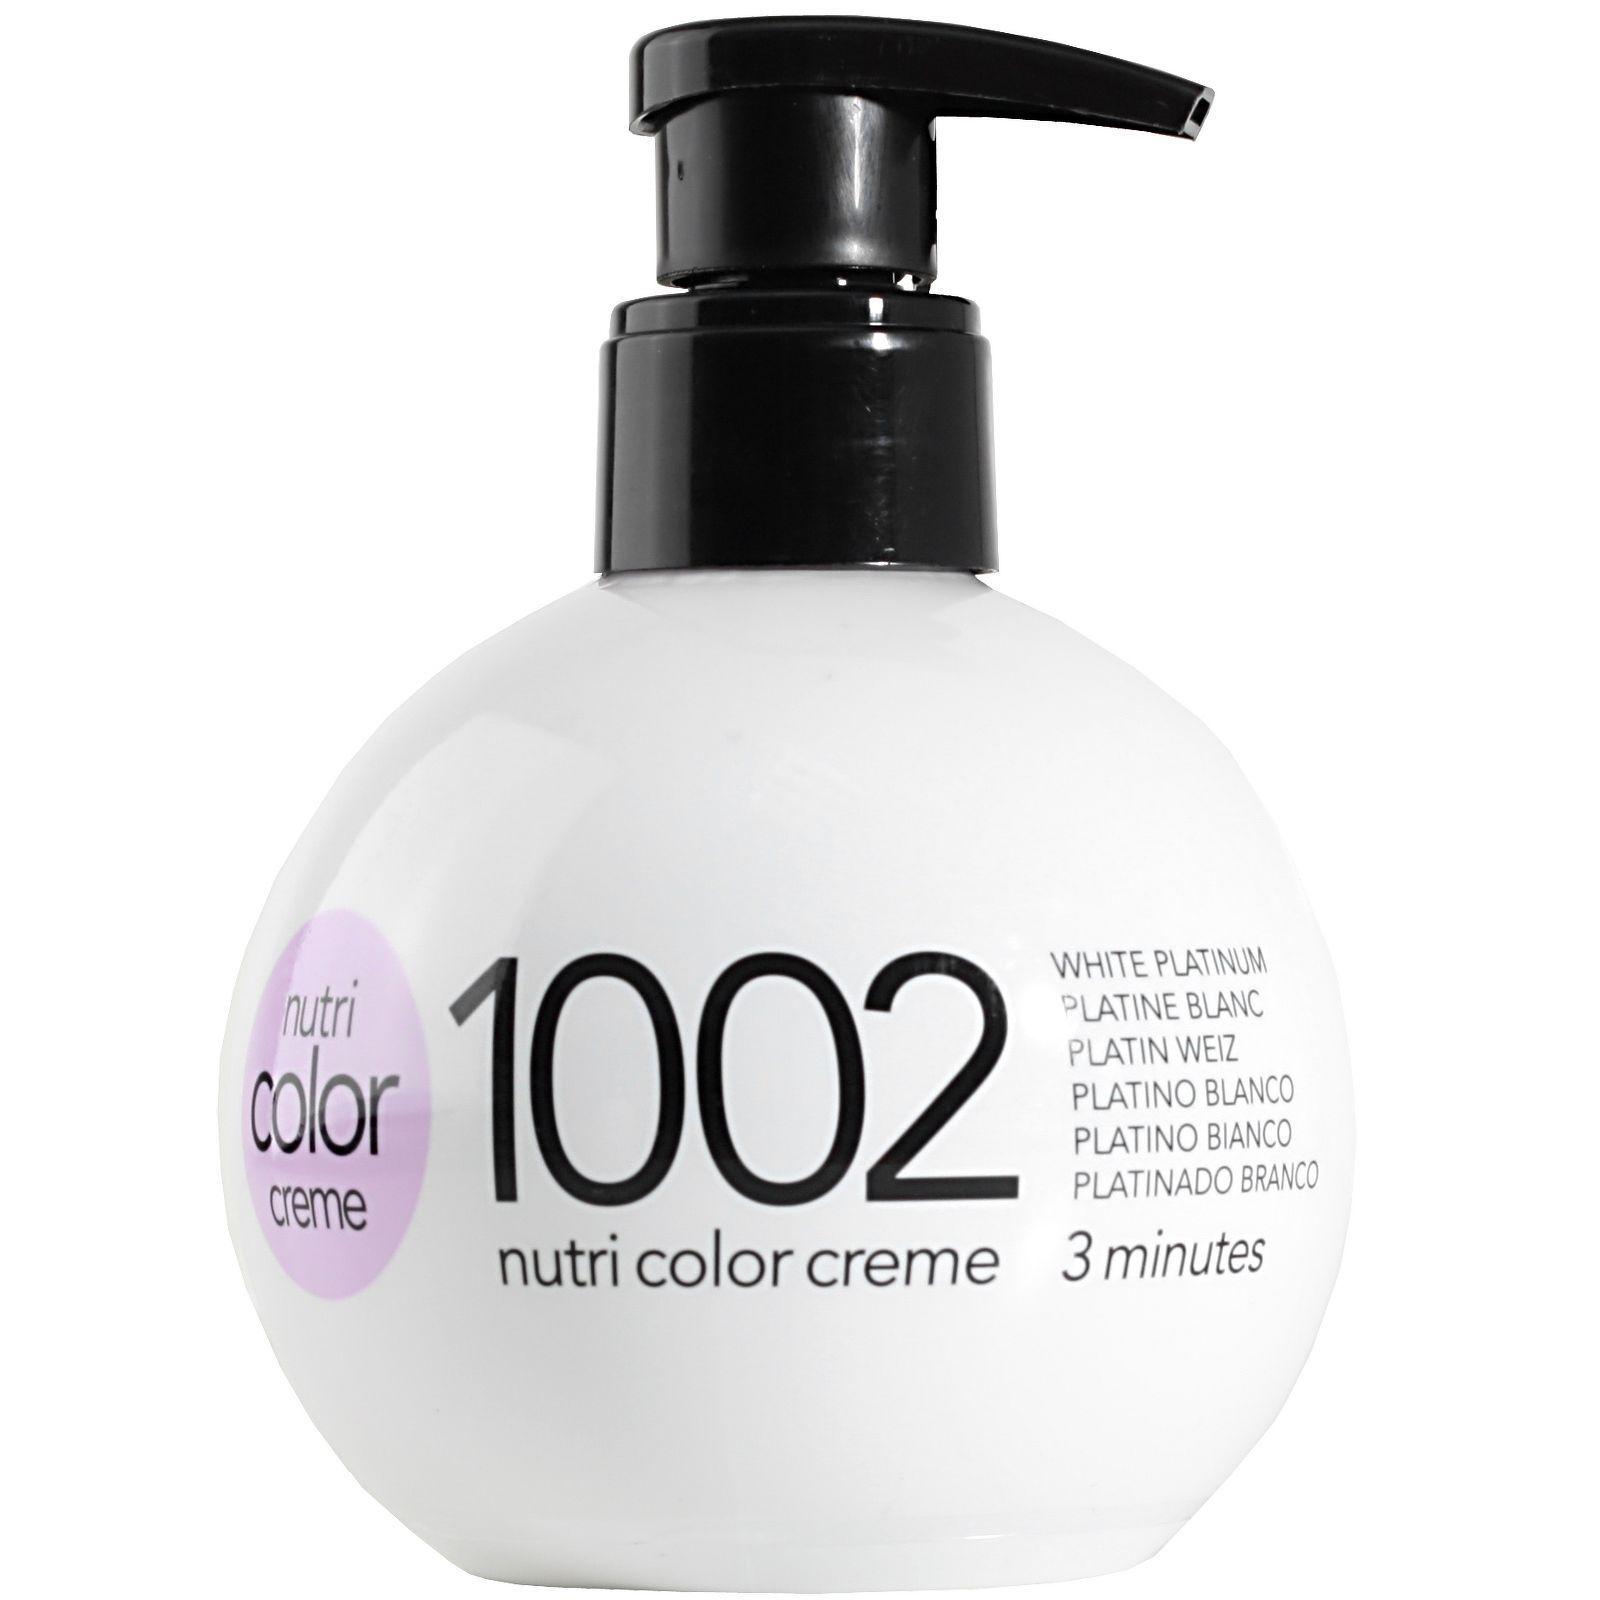 Revlon Professional Nutri Color Creme 1002 White Platinum 250ml   eBay